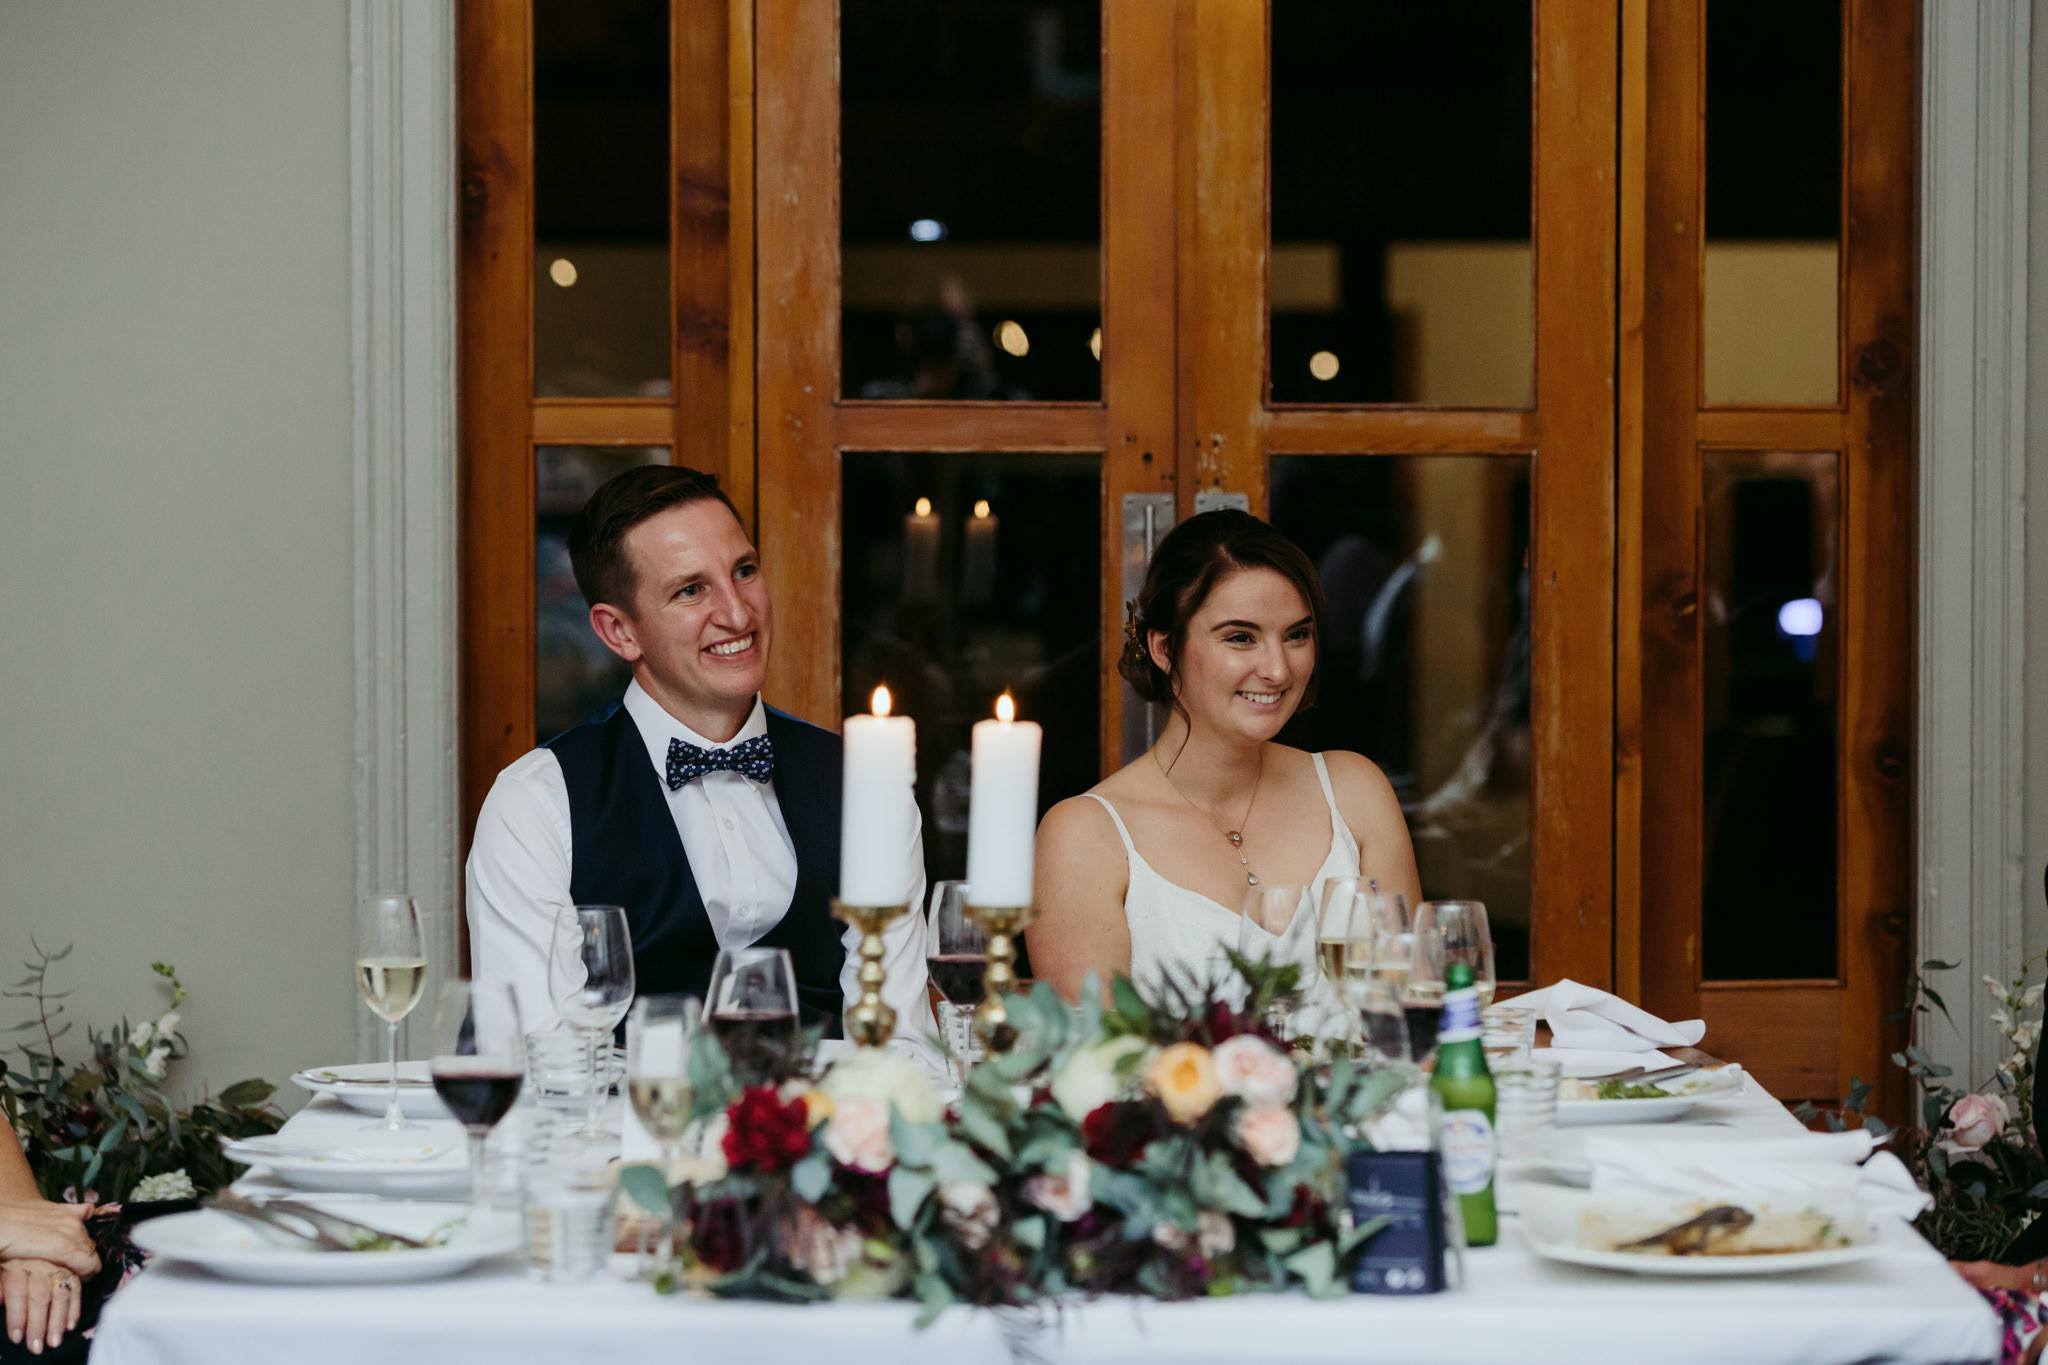 Erin Latimore Mudgee Canberra Wedding Photographer ROSEBANK GUESTHOUSE OLD THEATRE TONIC MILLTHORPE_736.JPG